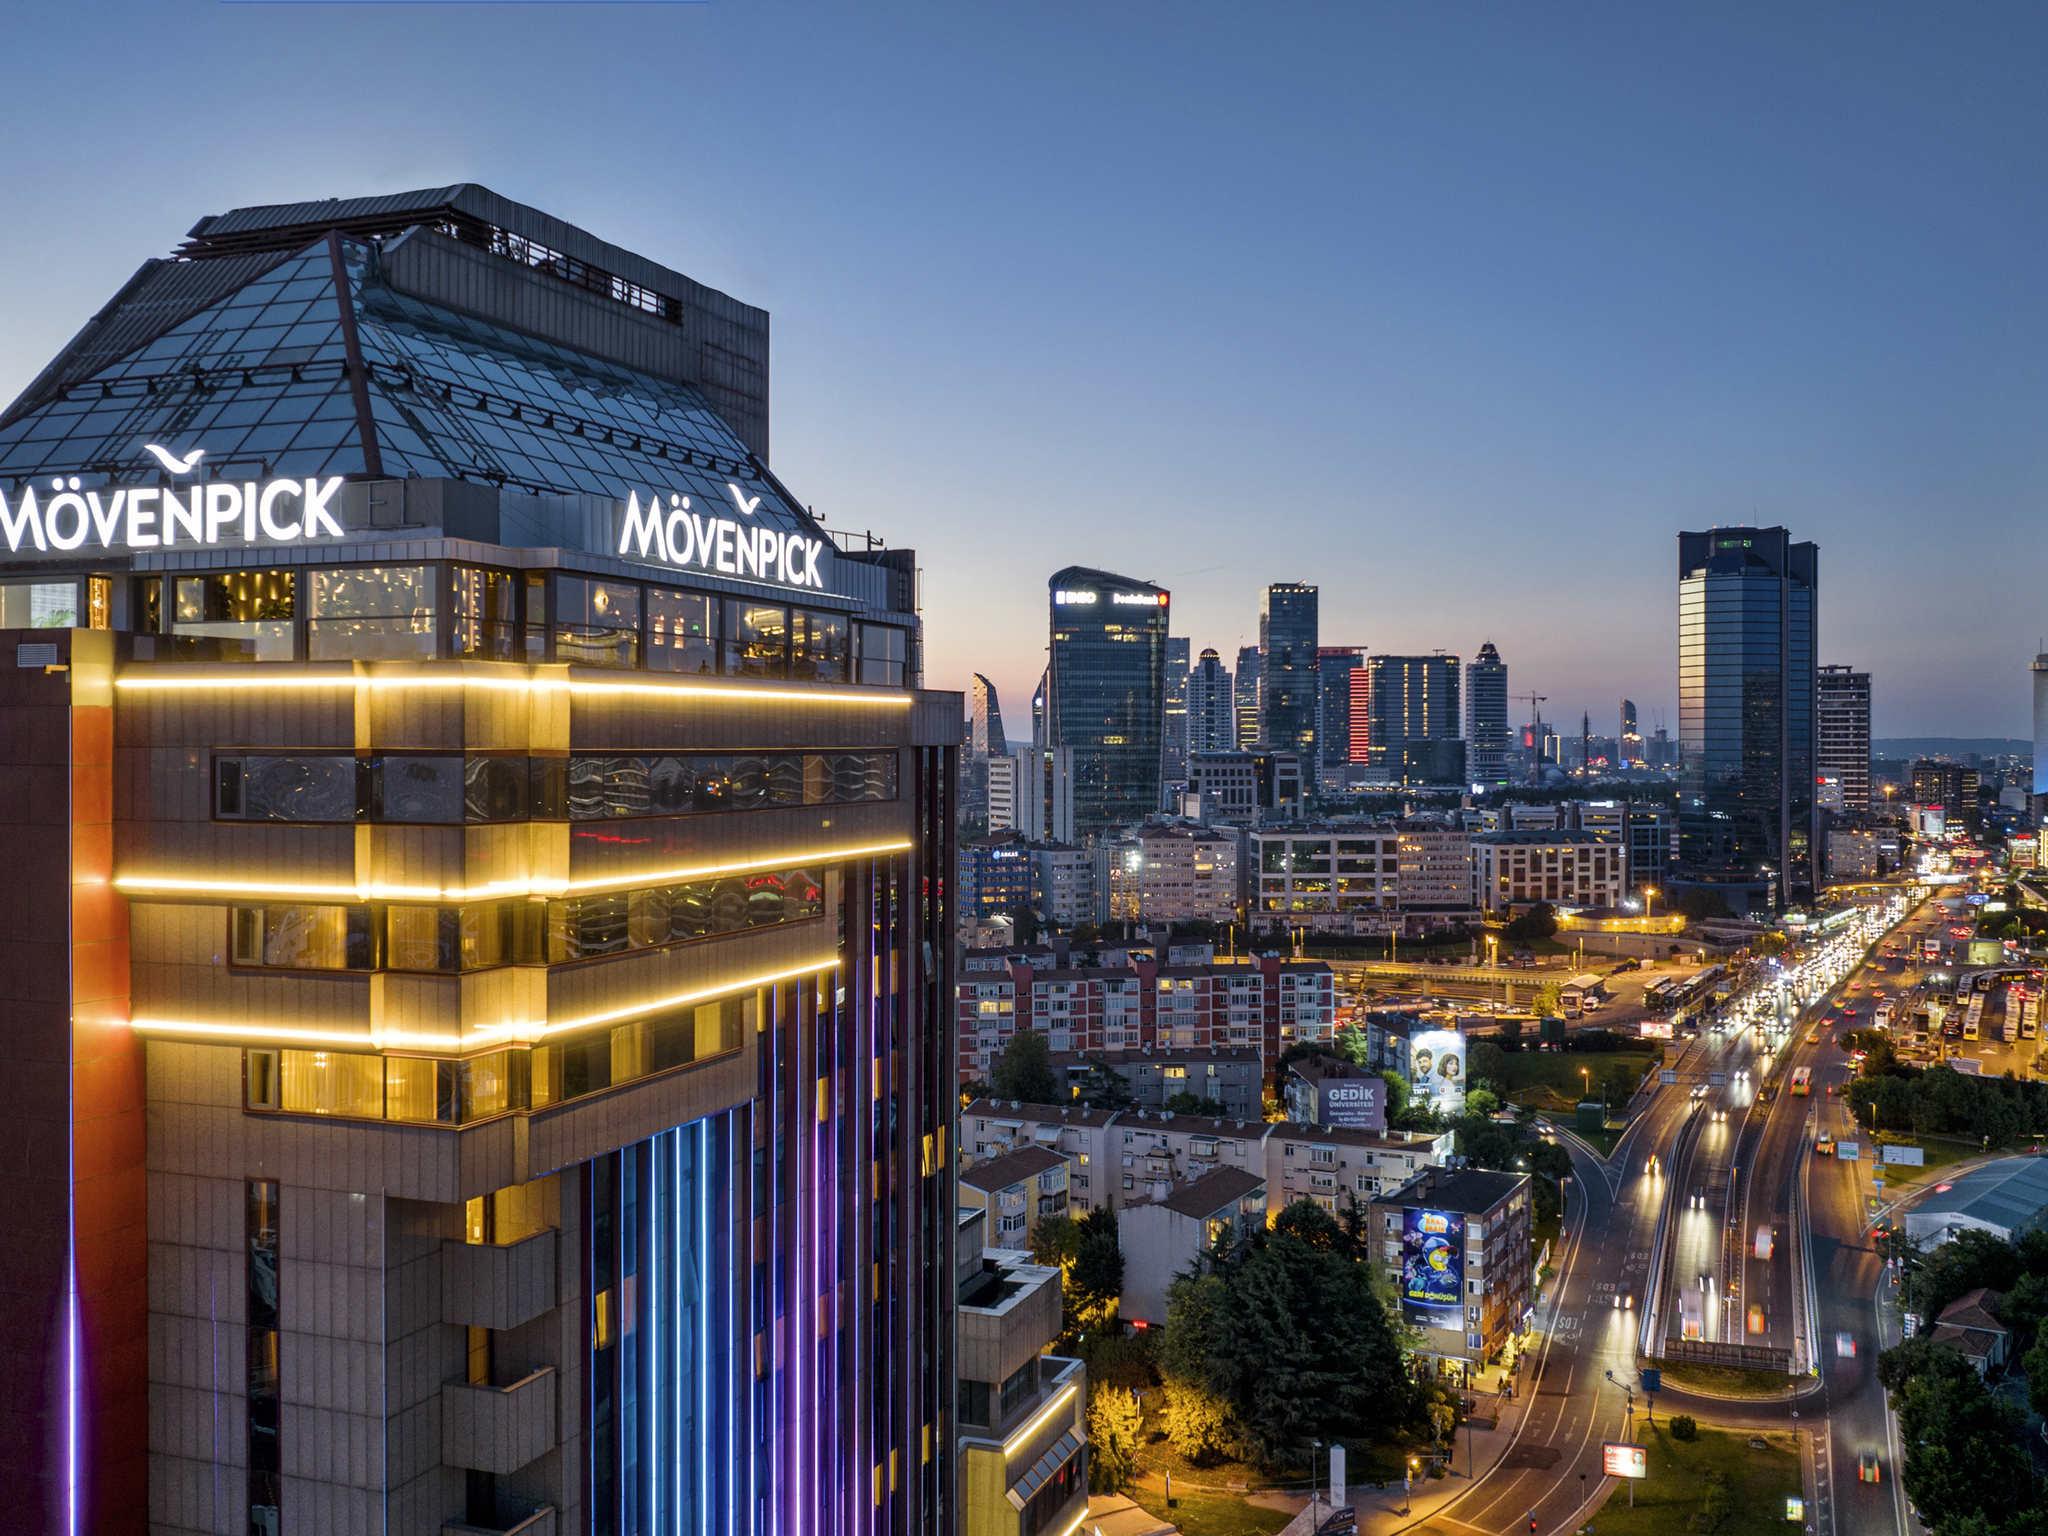 فندق - فندق مركيور Mercure إسطنبول سيتي البوسفور